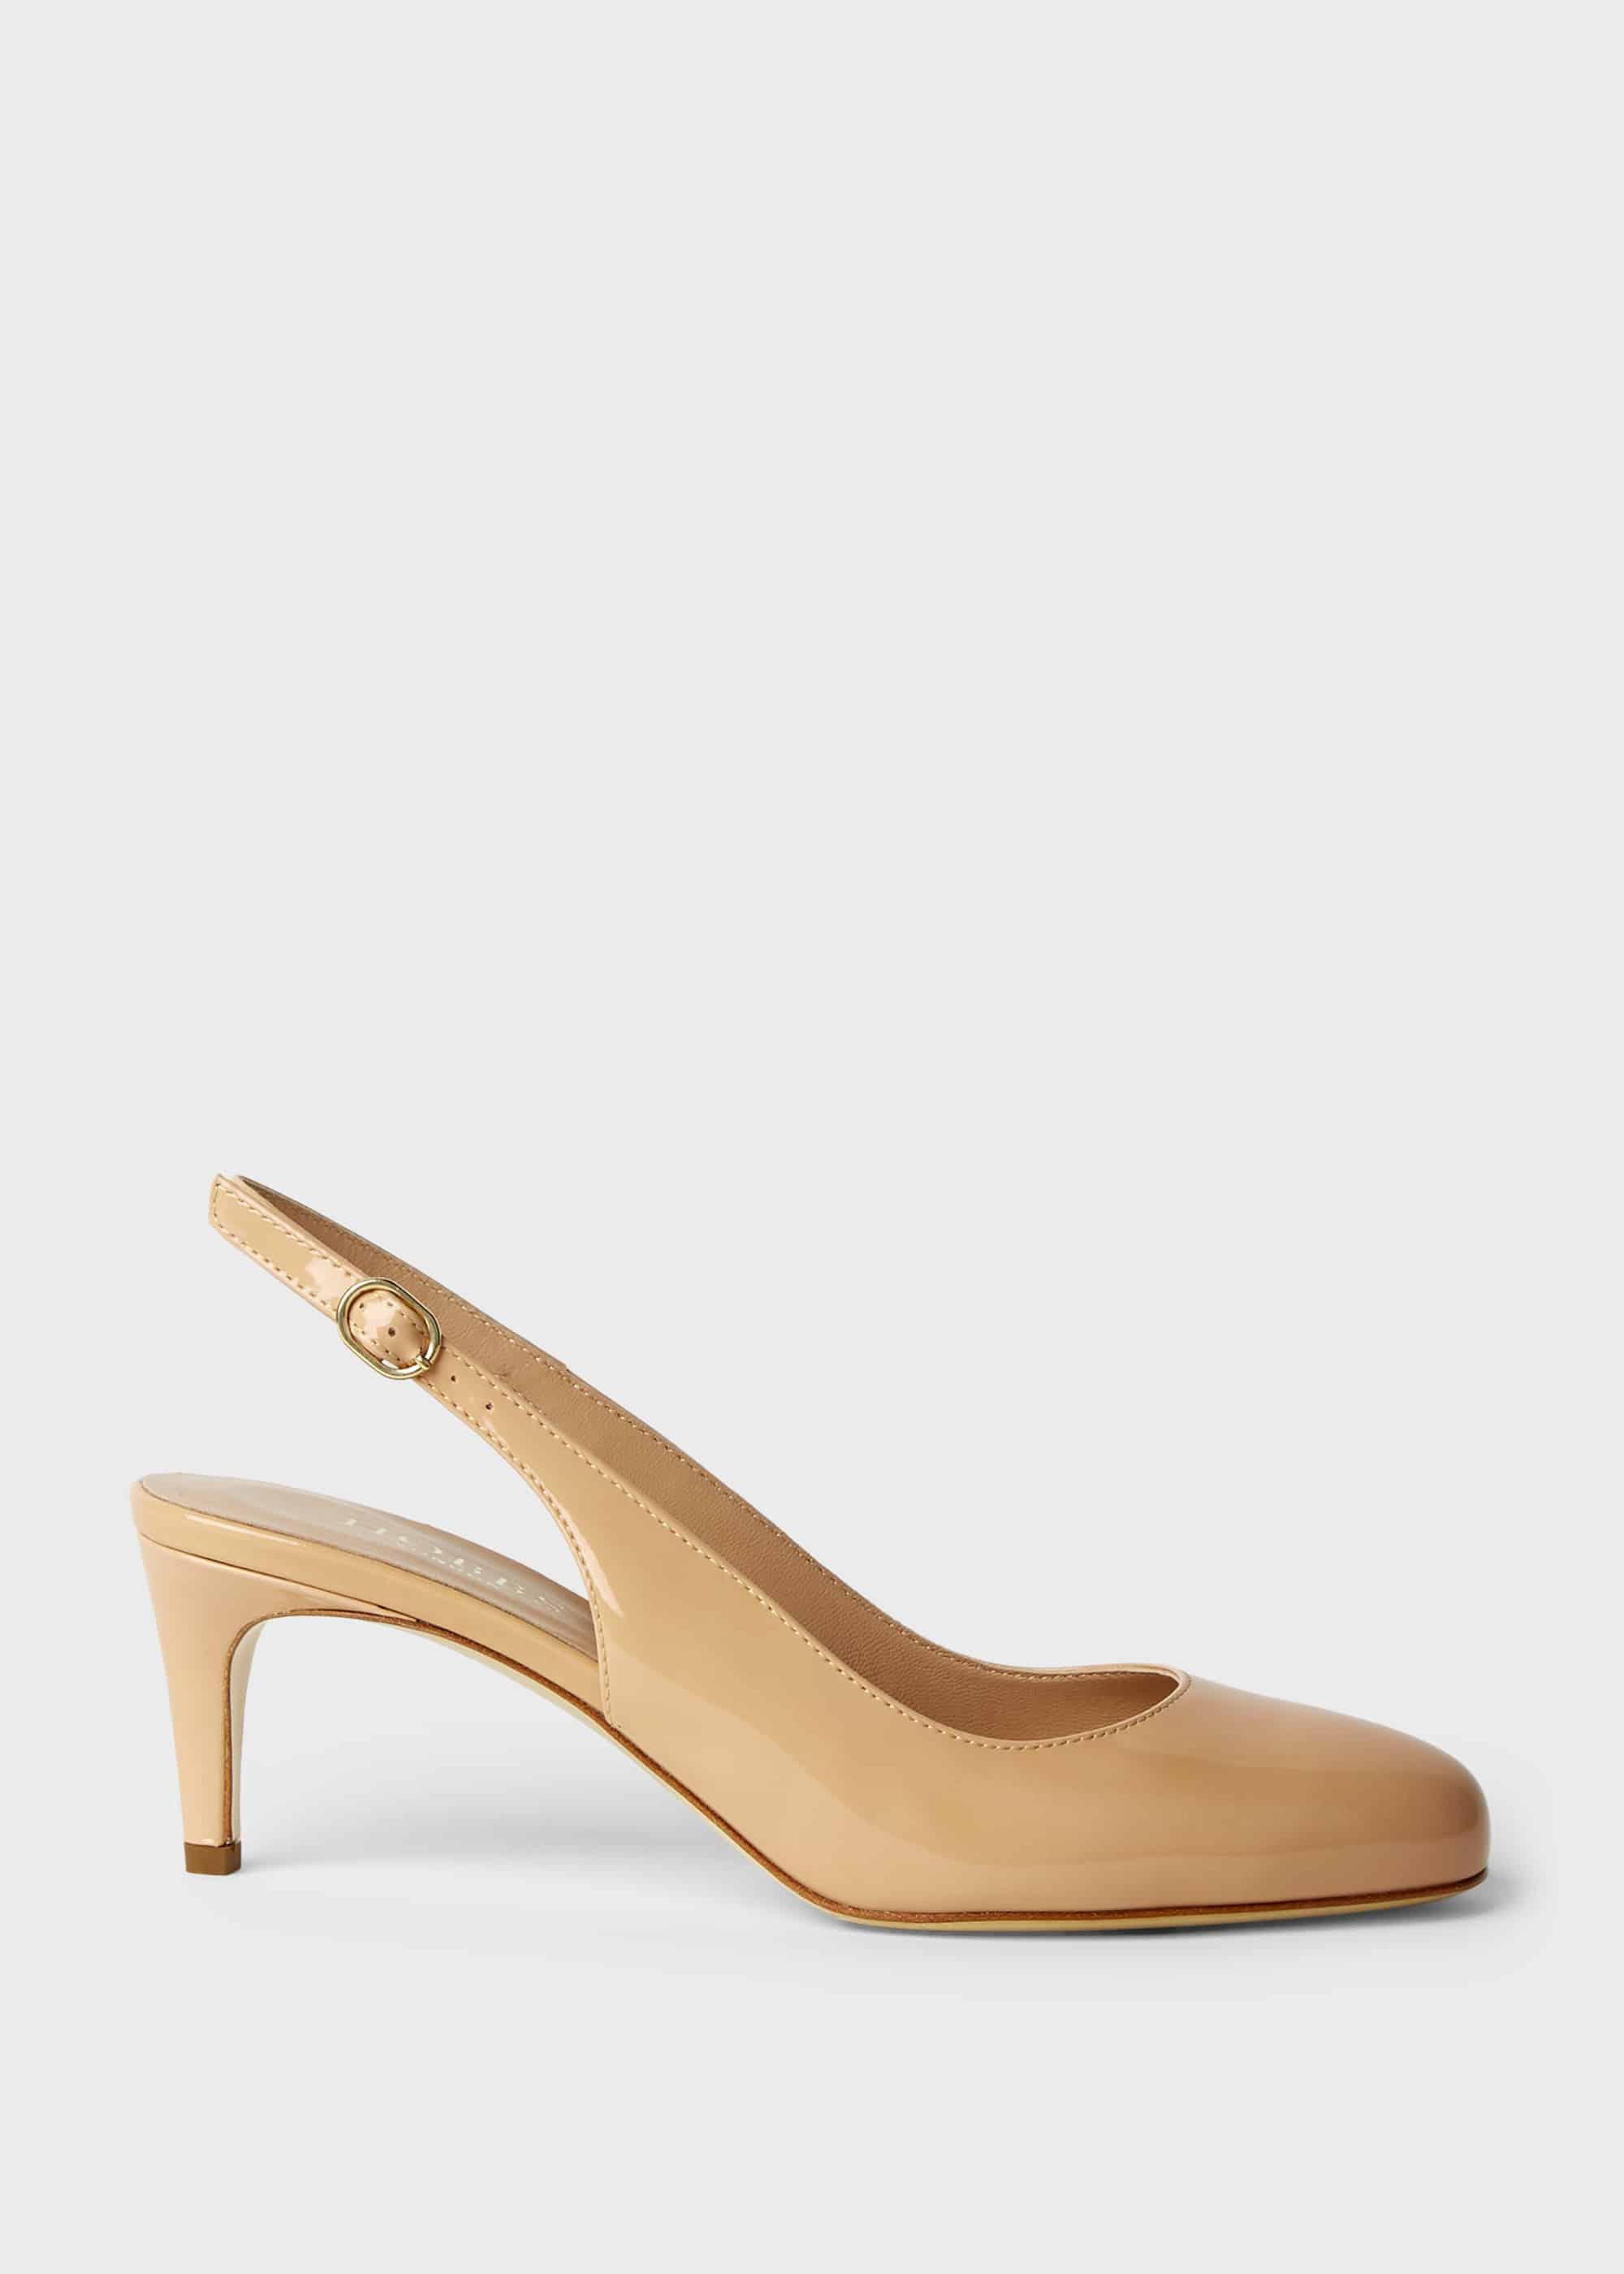 Hobbs Women Emma Patent Stiletto Slingback Court Shoes